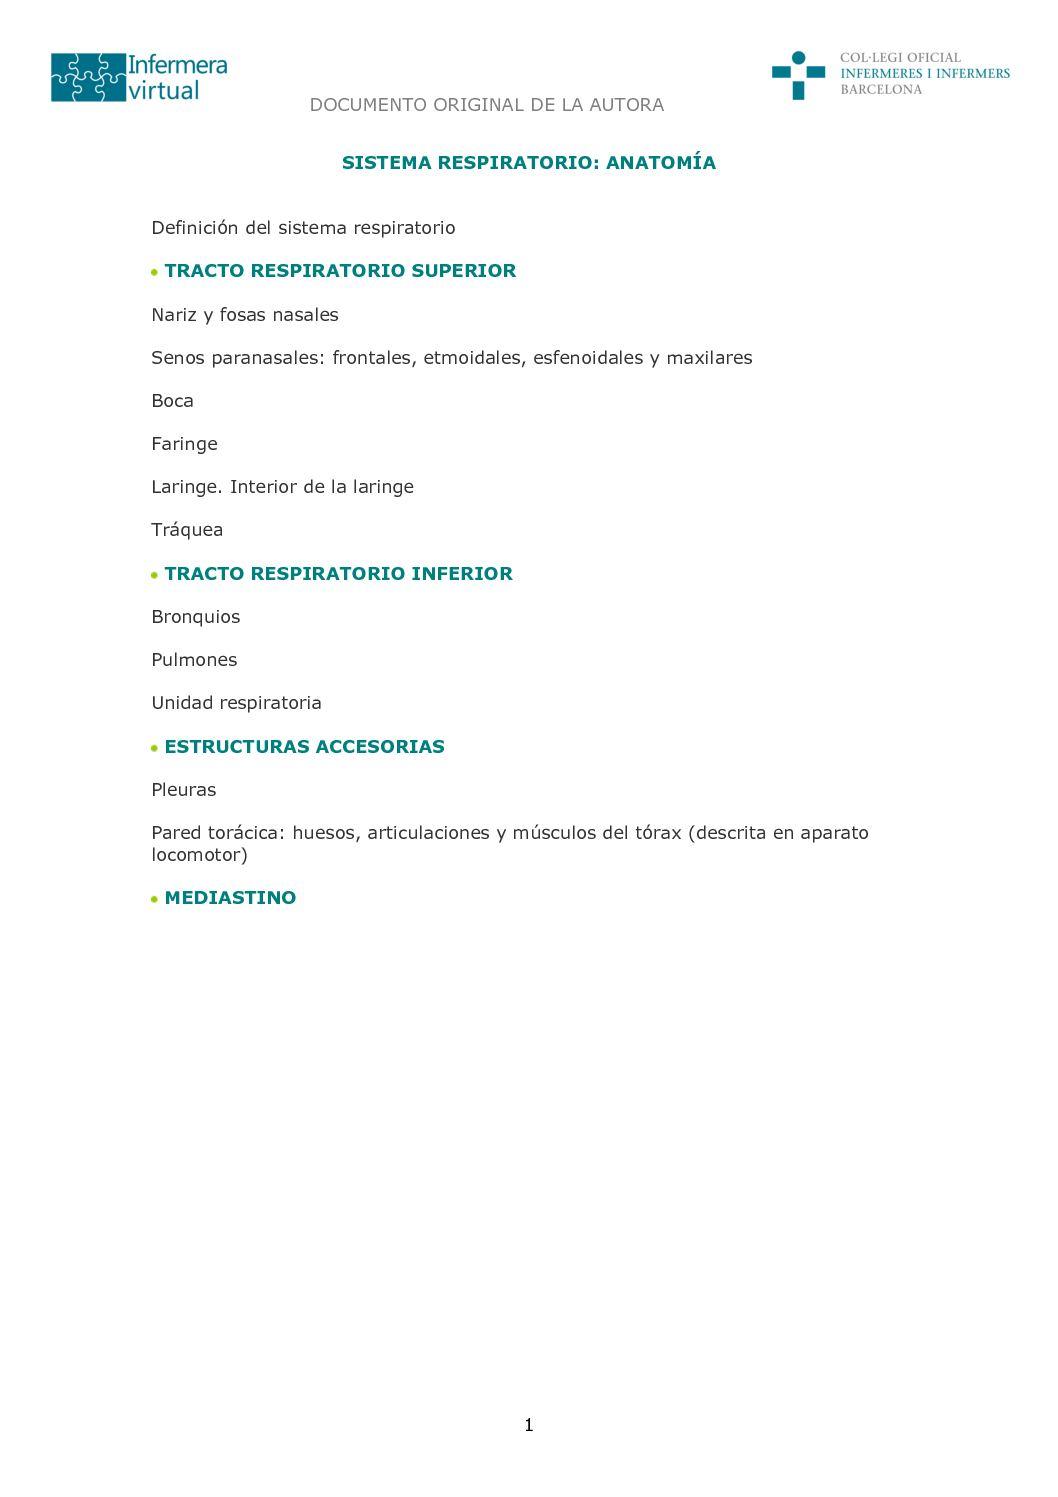 Calaméo - Anatomia Sistema Respiratorio